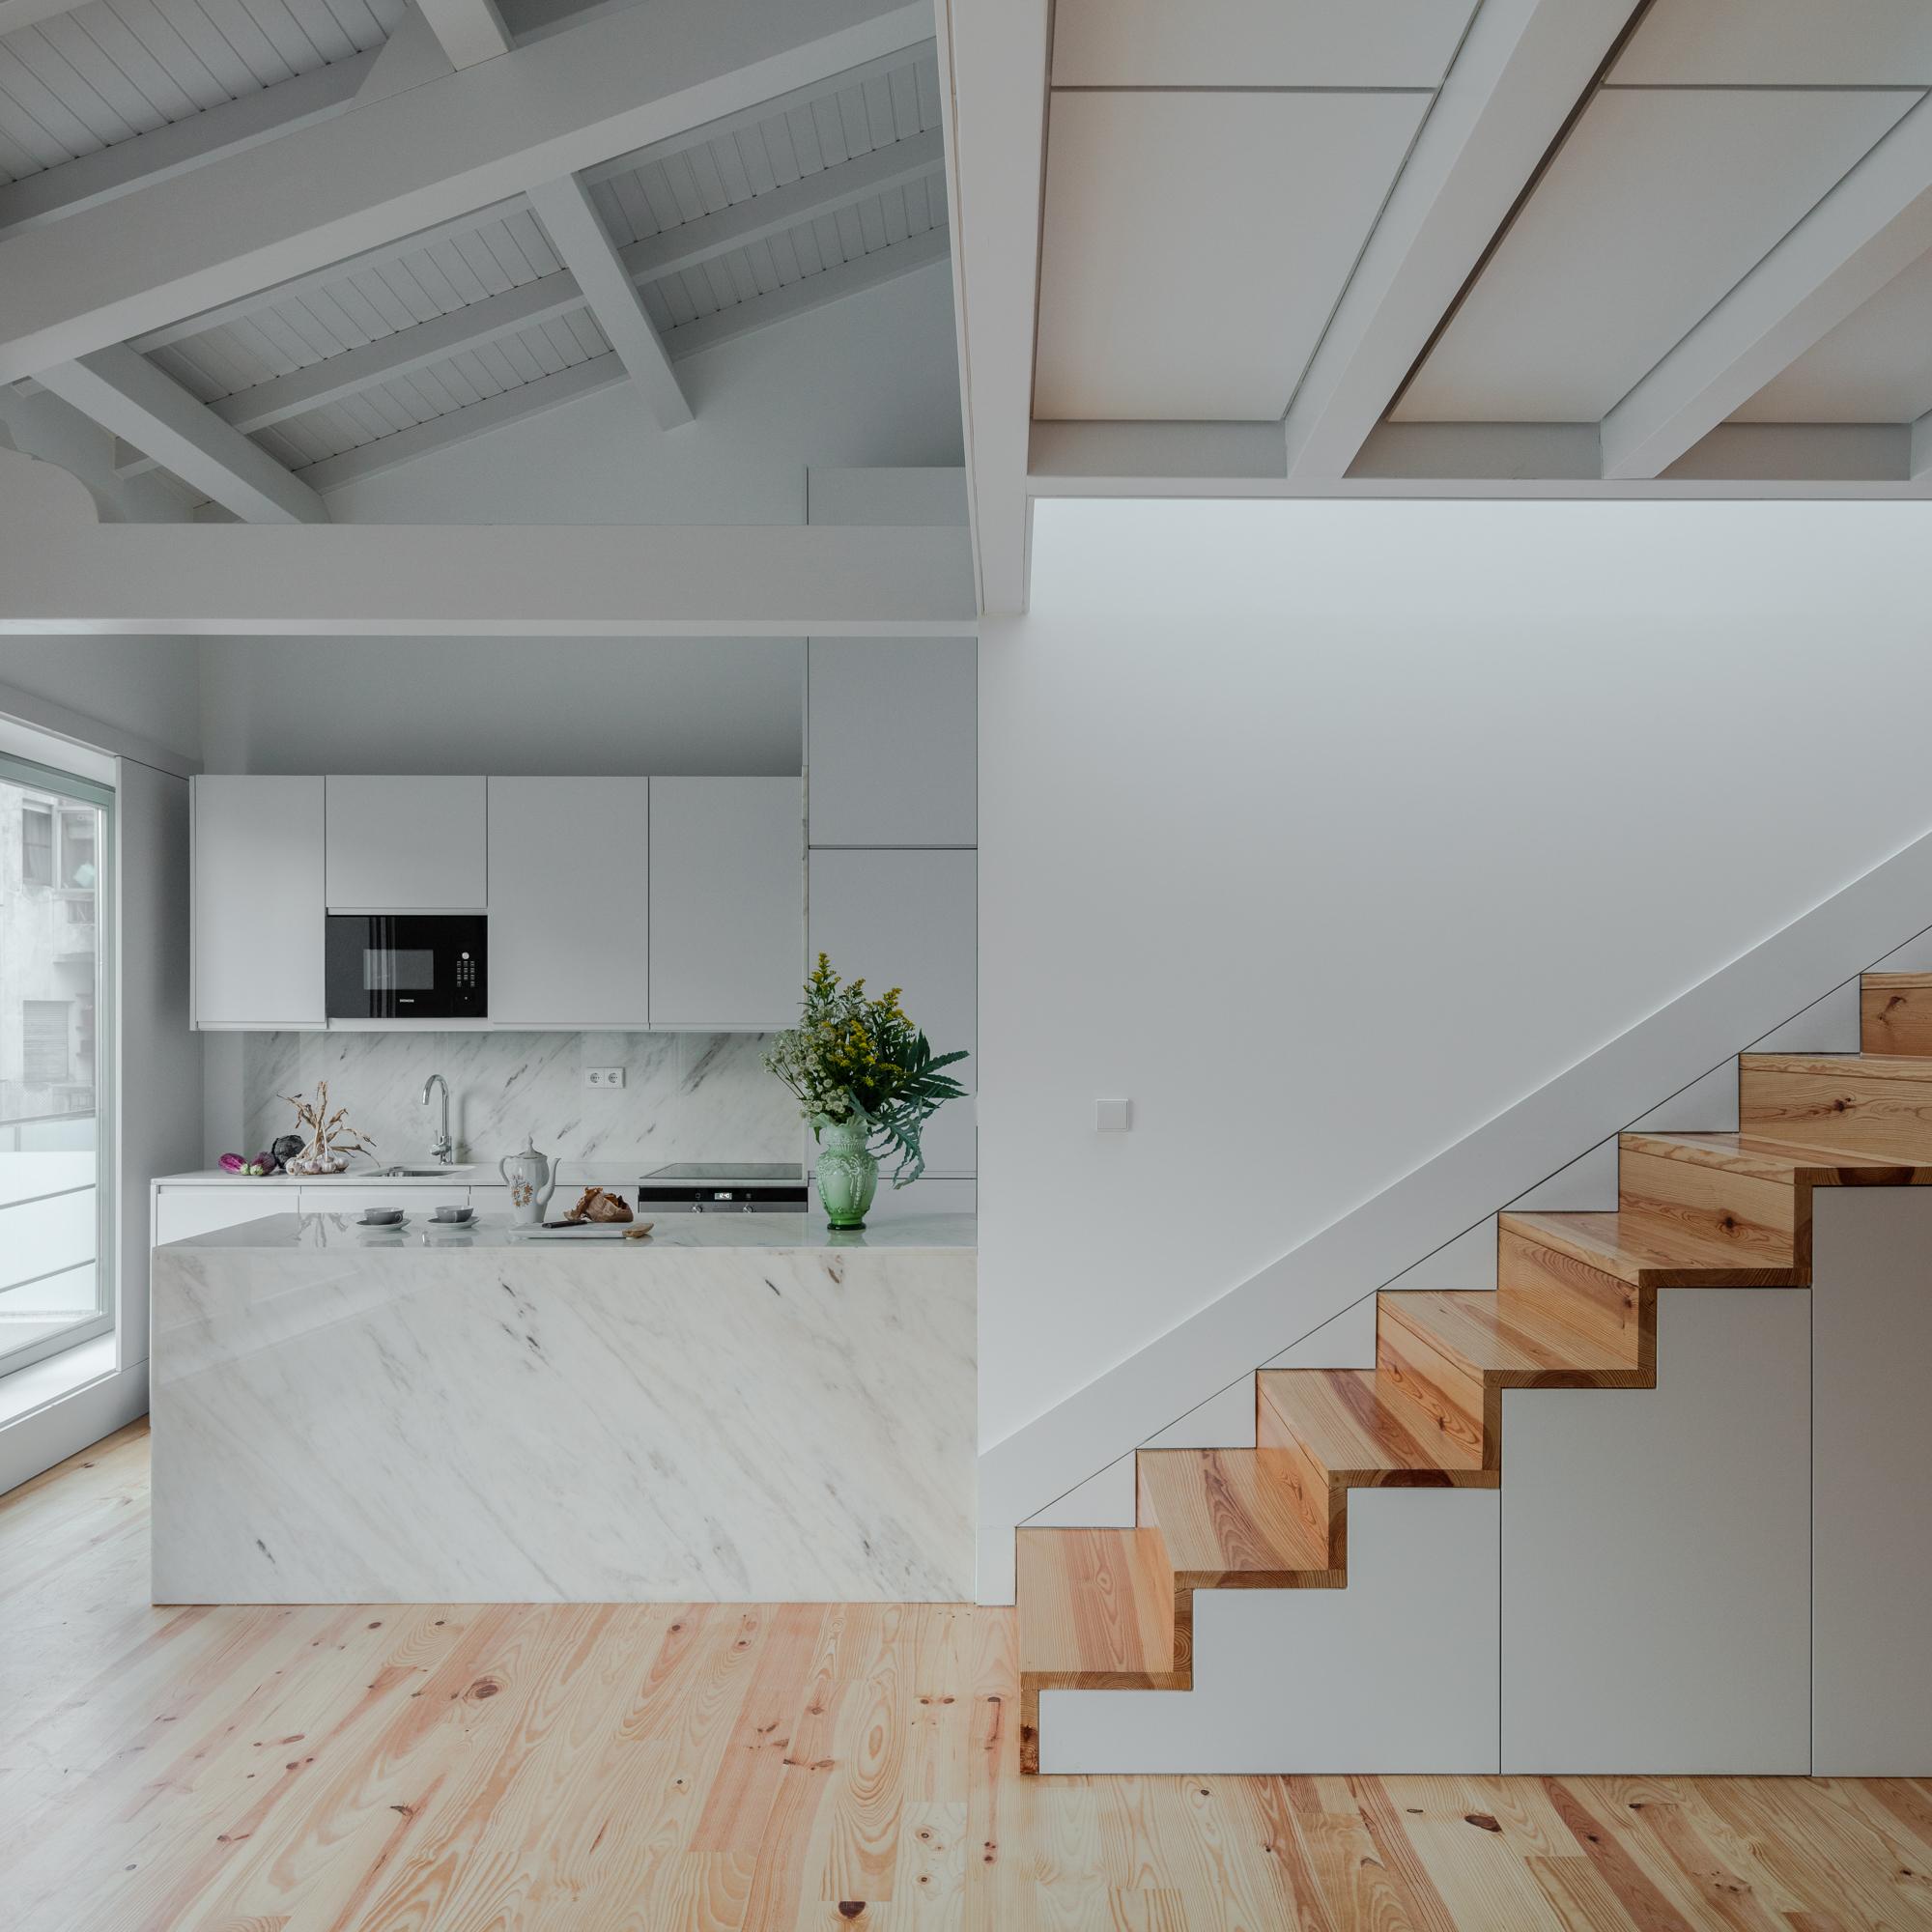 Alves Da Veiga Pedro Ferreira Architecture Studio